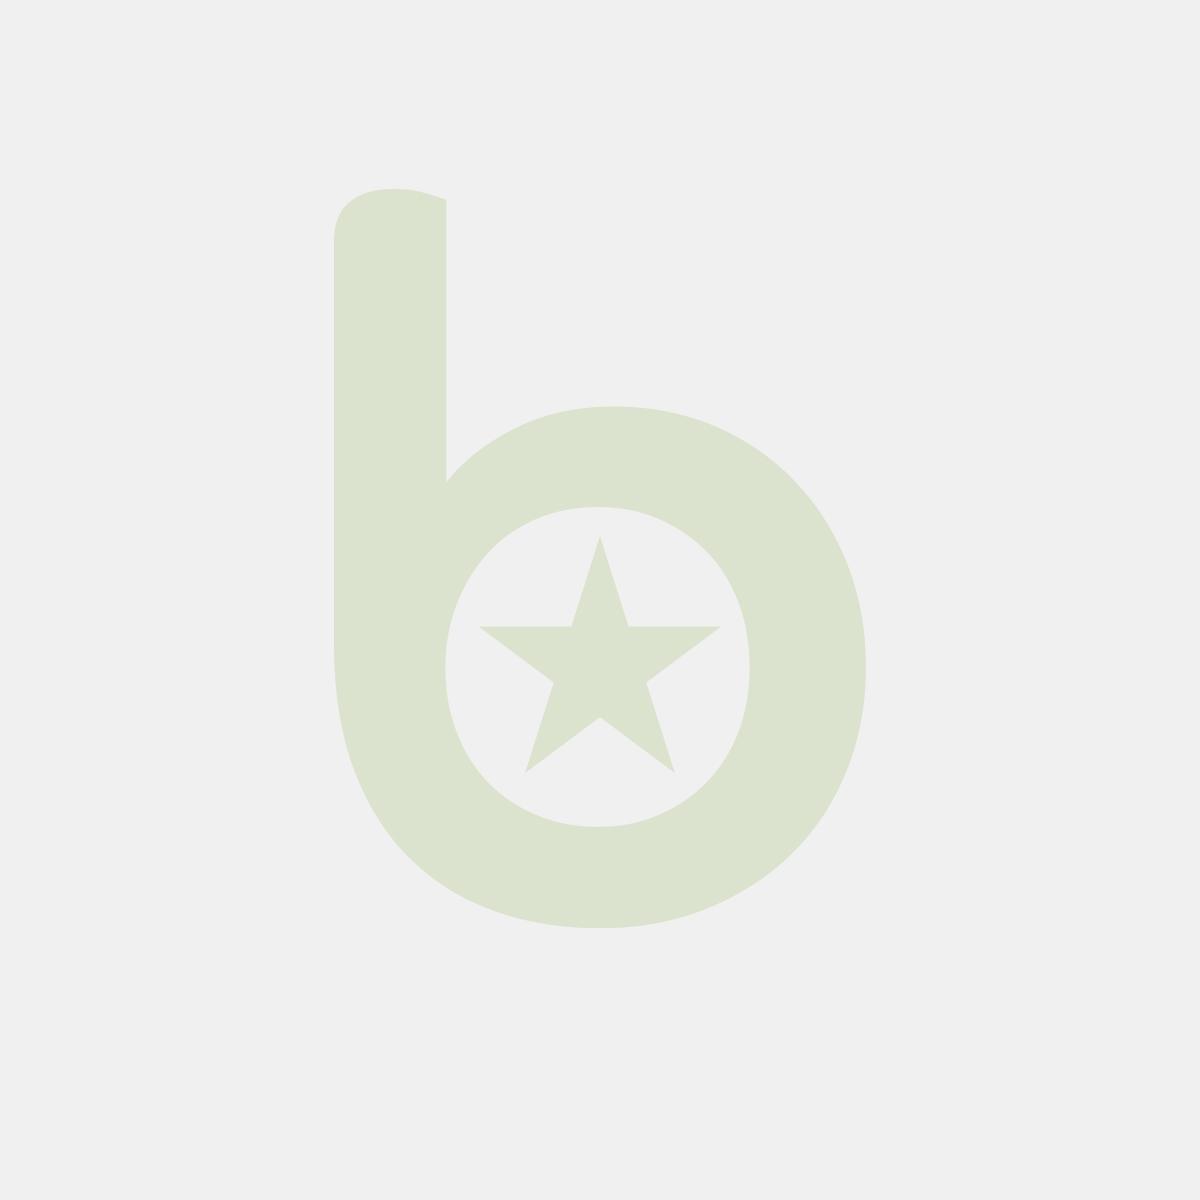 FINGERFOOD - pucharek PS biały 200ml 8x8x6,3 op. 12 sztuk